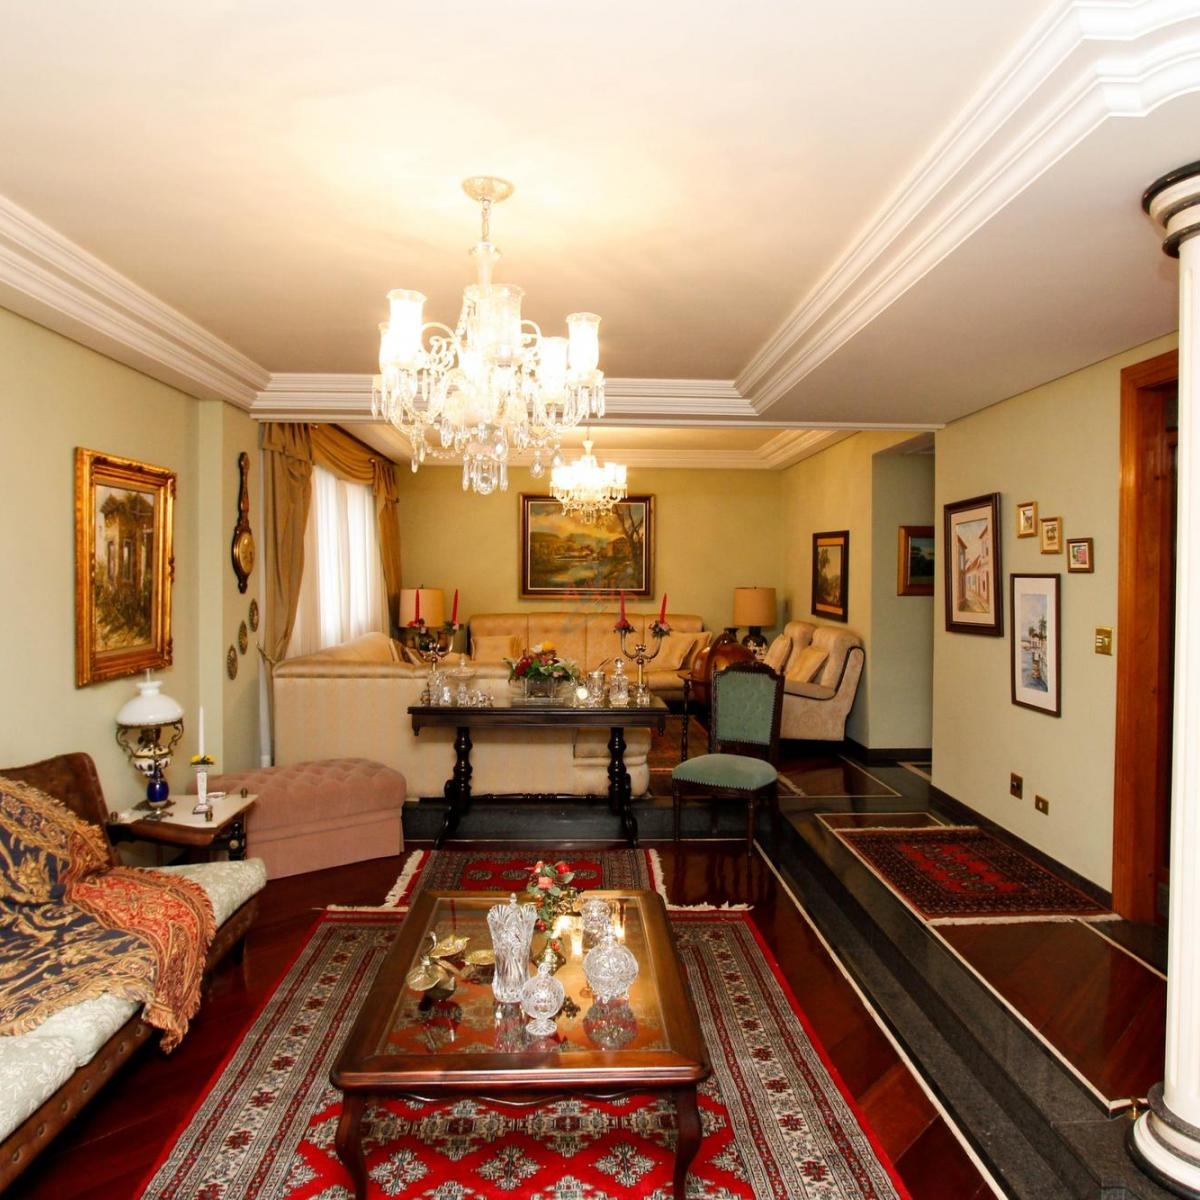 http://www.infocenterhost2.com.br/crm/fotosimovel/22142/471302-apartamento-curitiba-alto-da-gloria_marcadagua.jpg